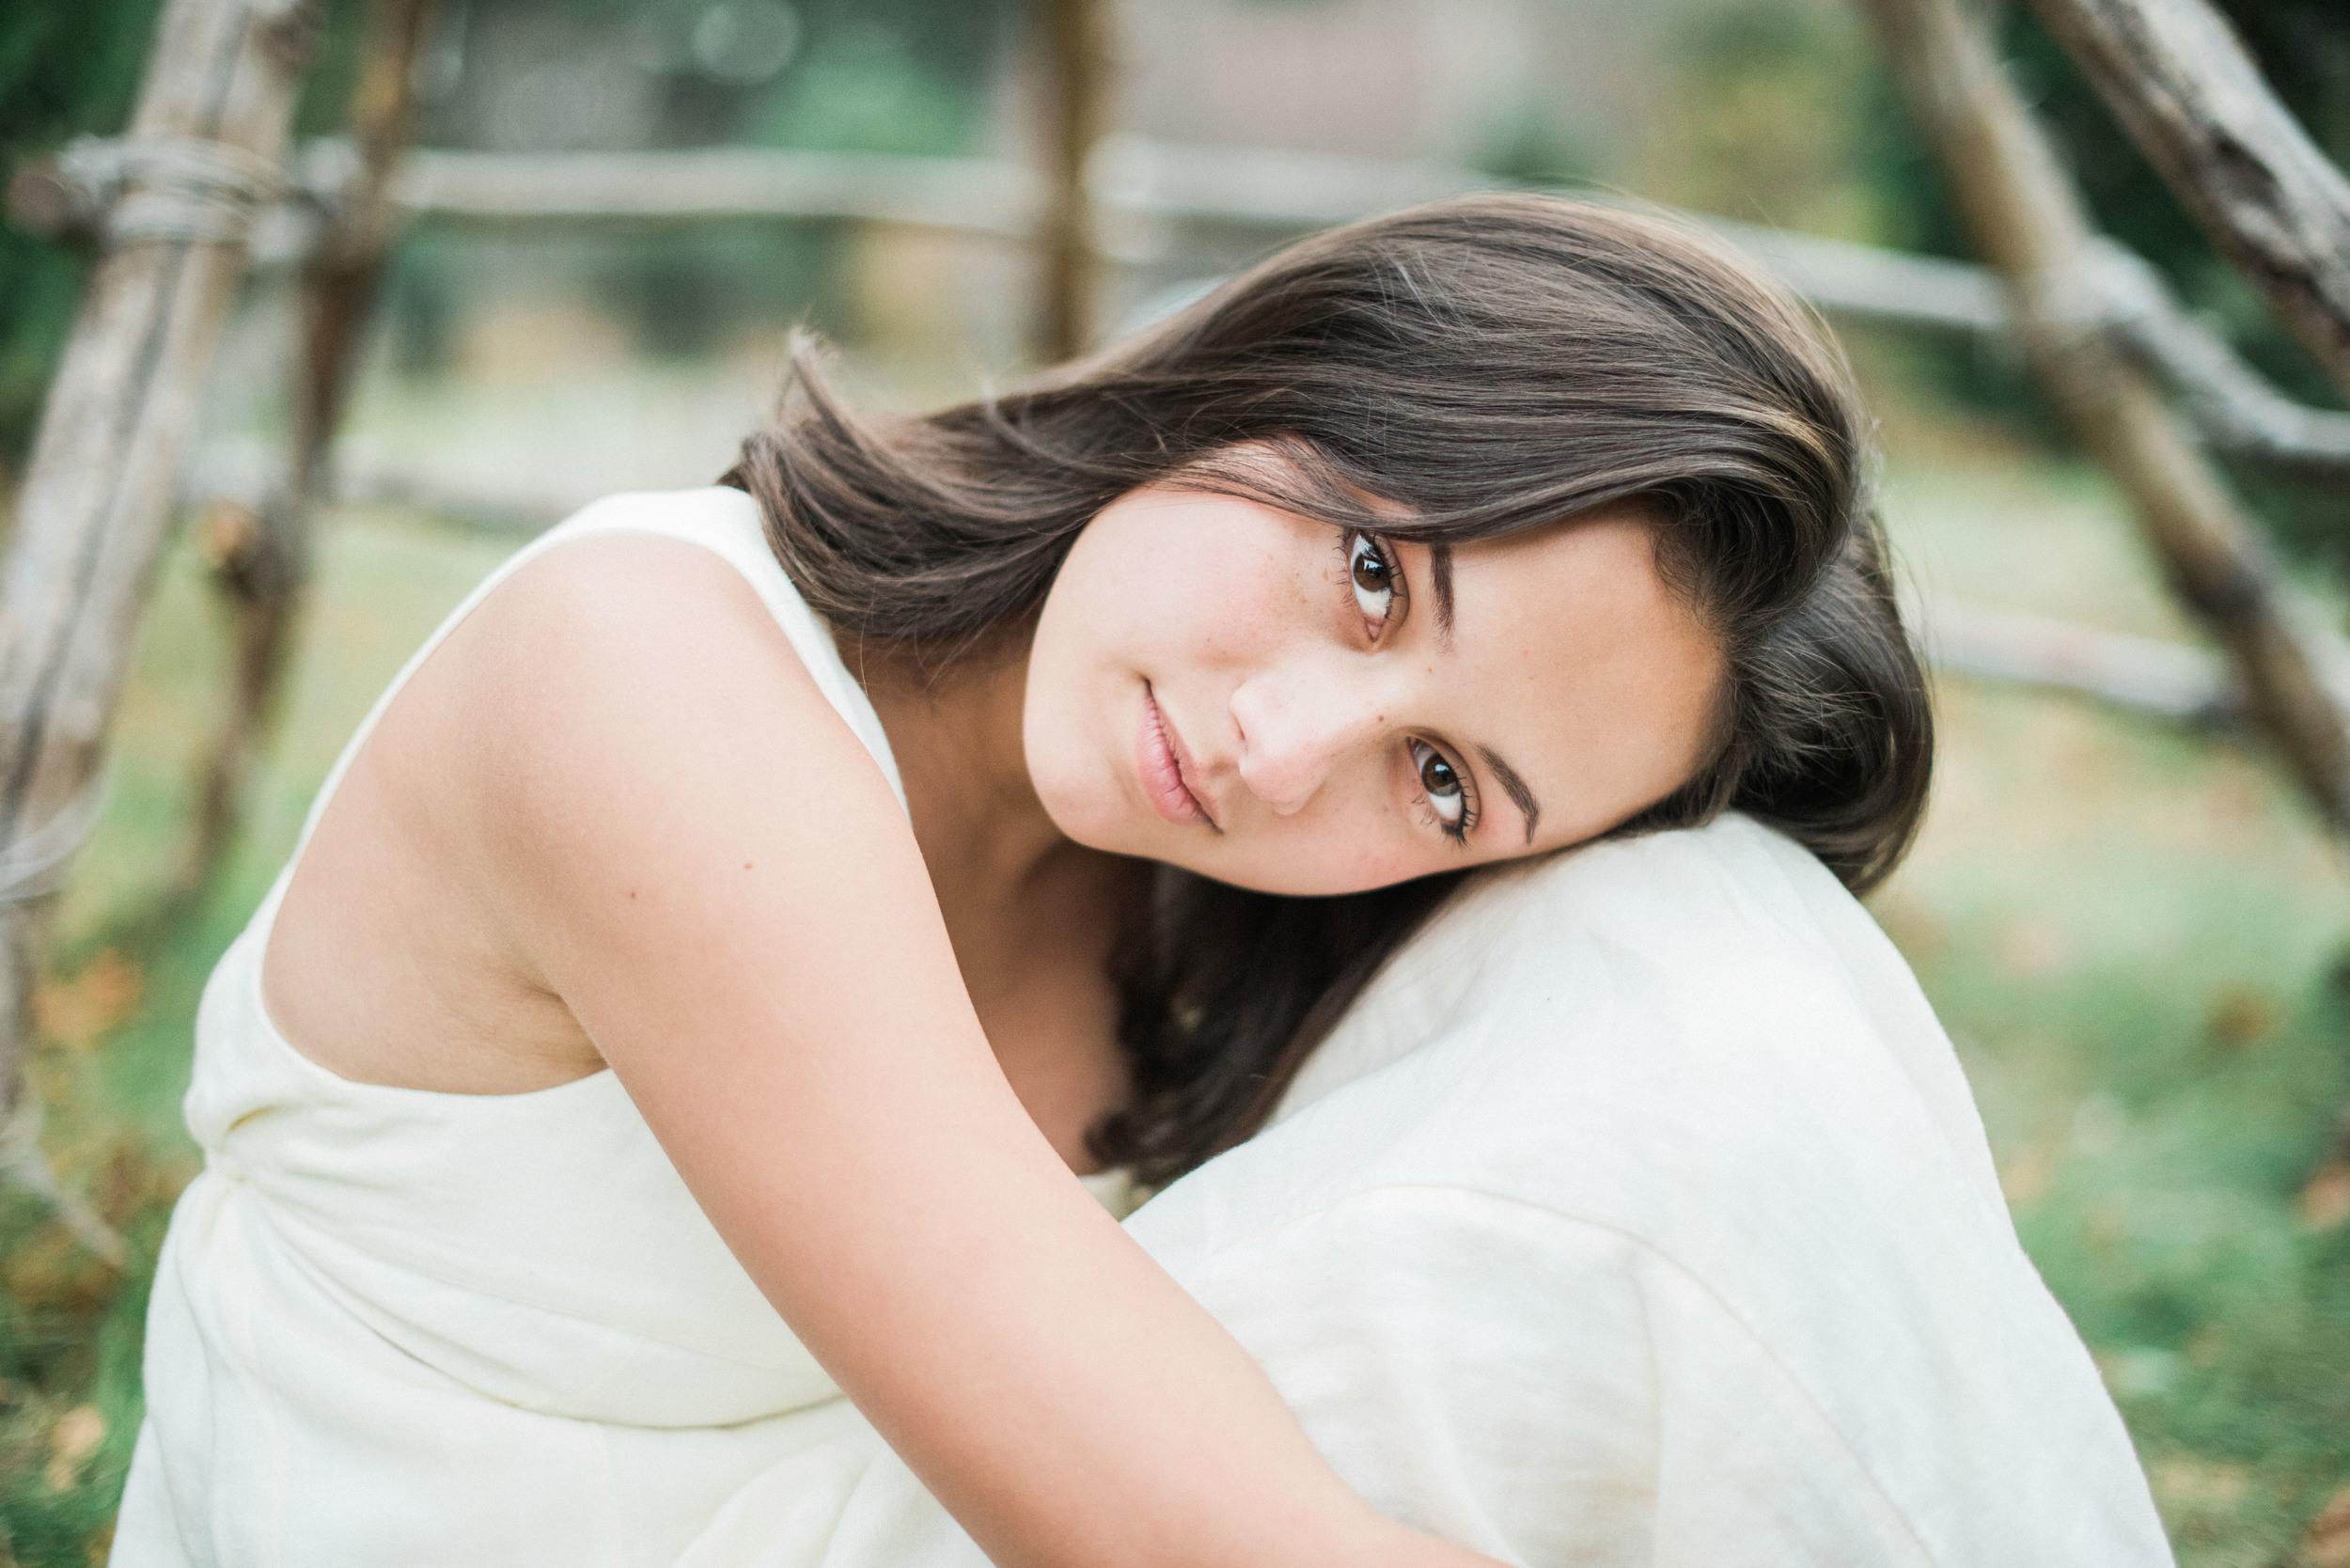 Senior Portrait Photographer in Amherst